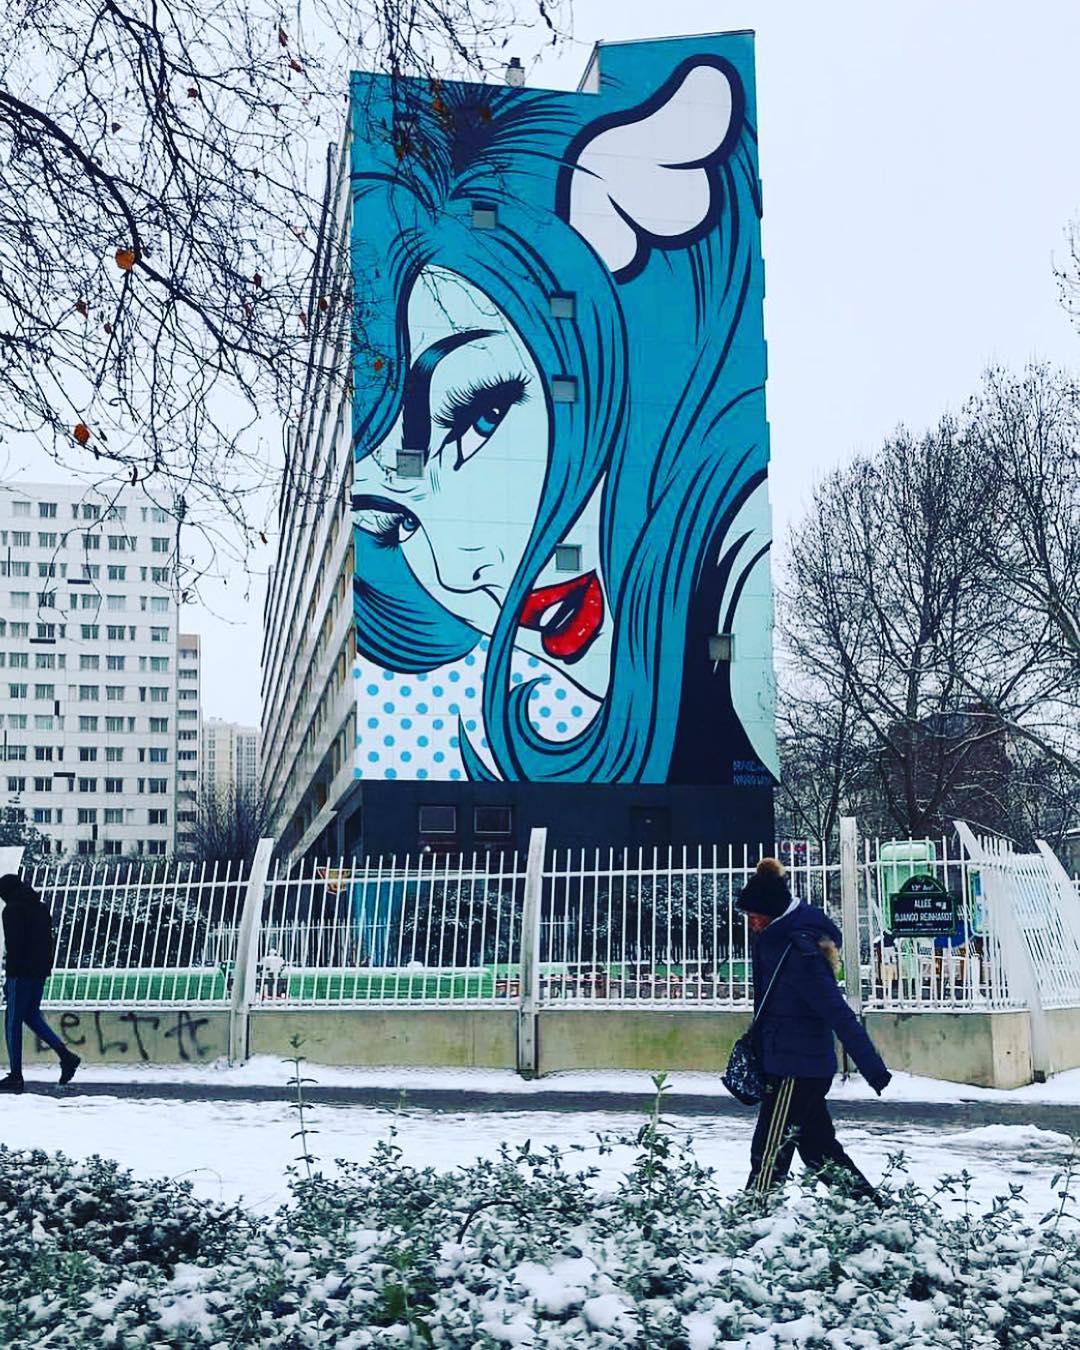 Artwork By D*face in Paris